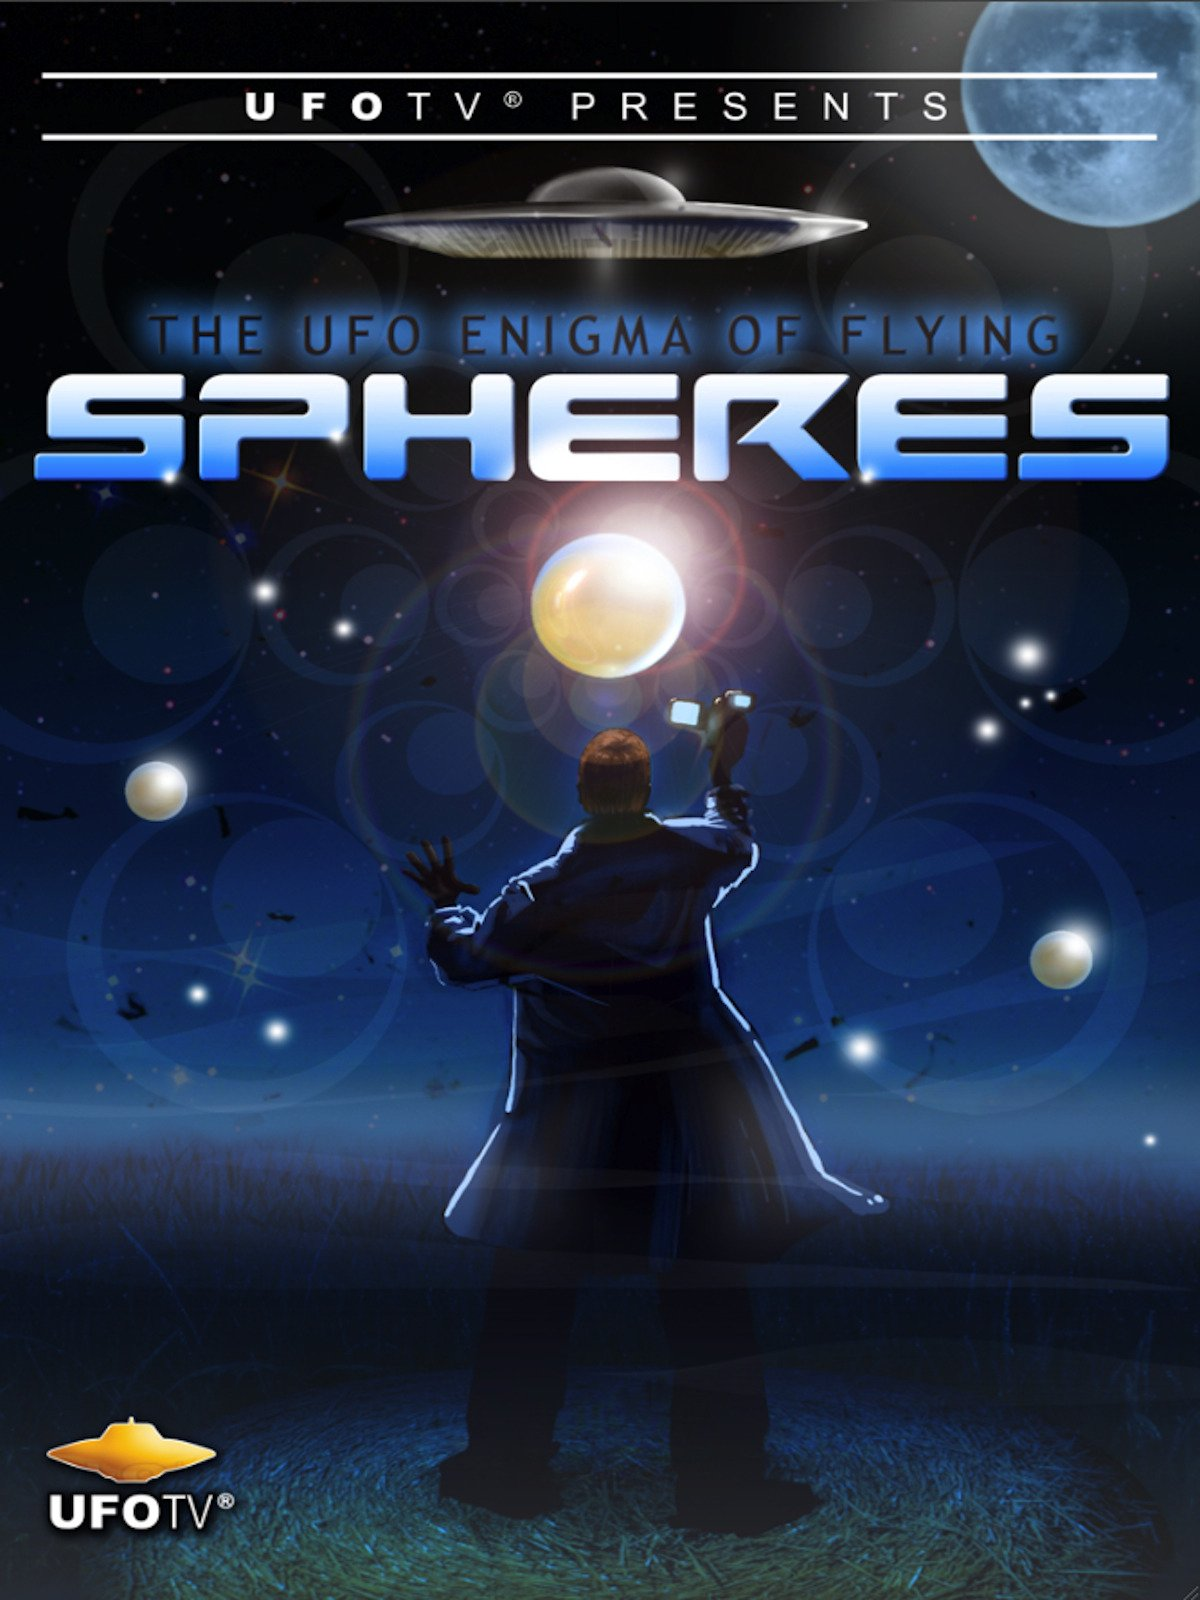 UFOTV Presents: The UFO Enigma of Flying Spheres on Amazon Prime Video UK